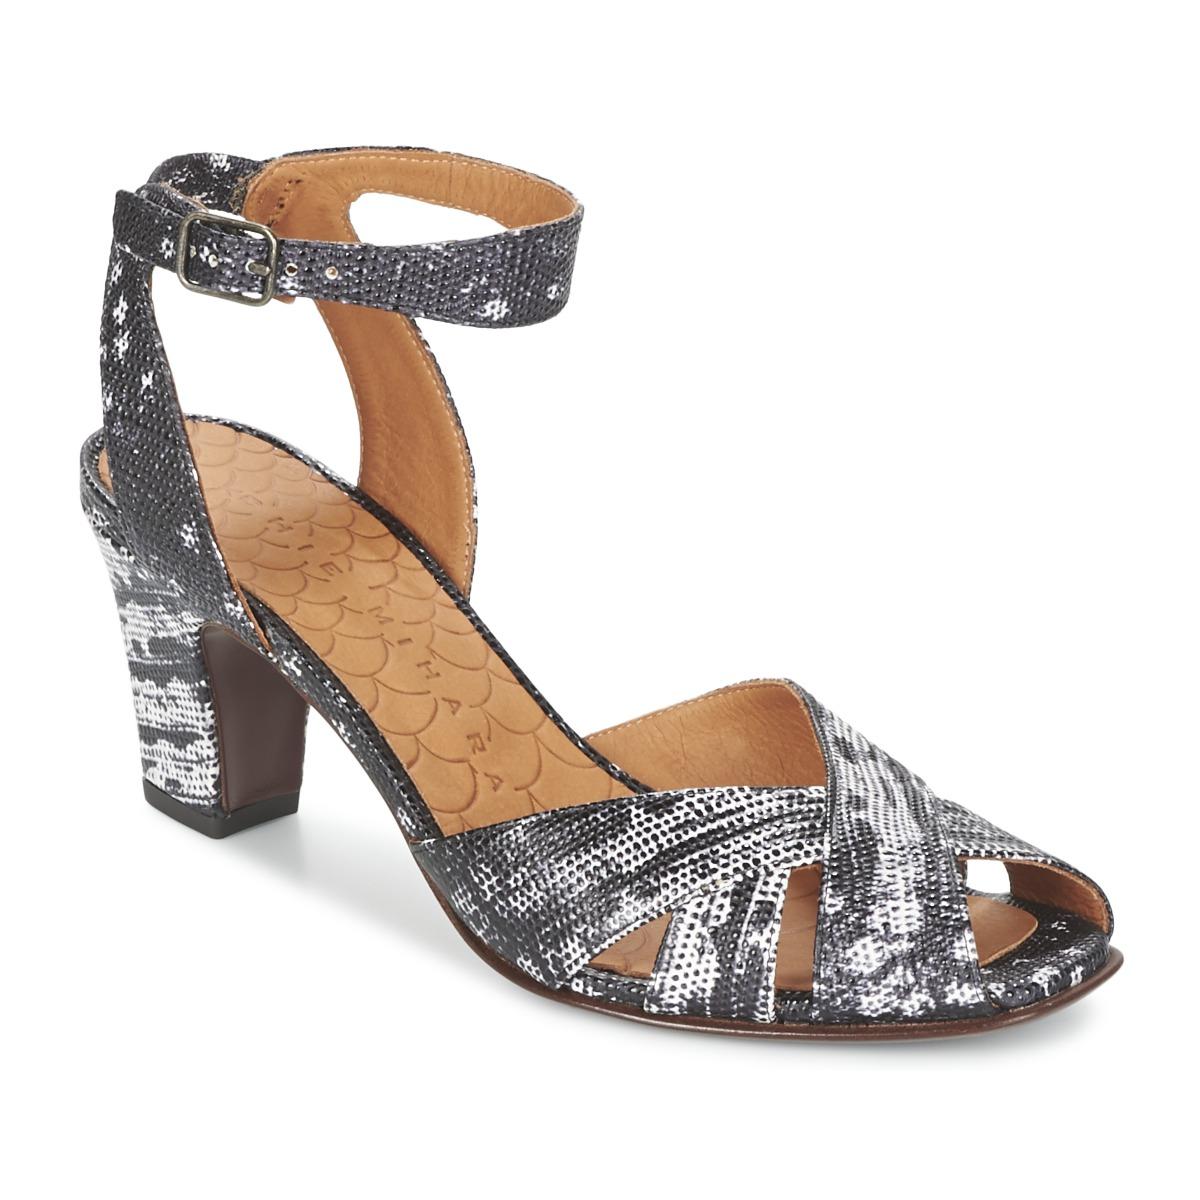 Sandale Chie Mihara HART Noir / Blanc